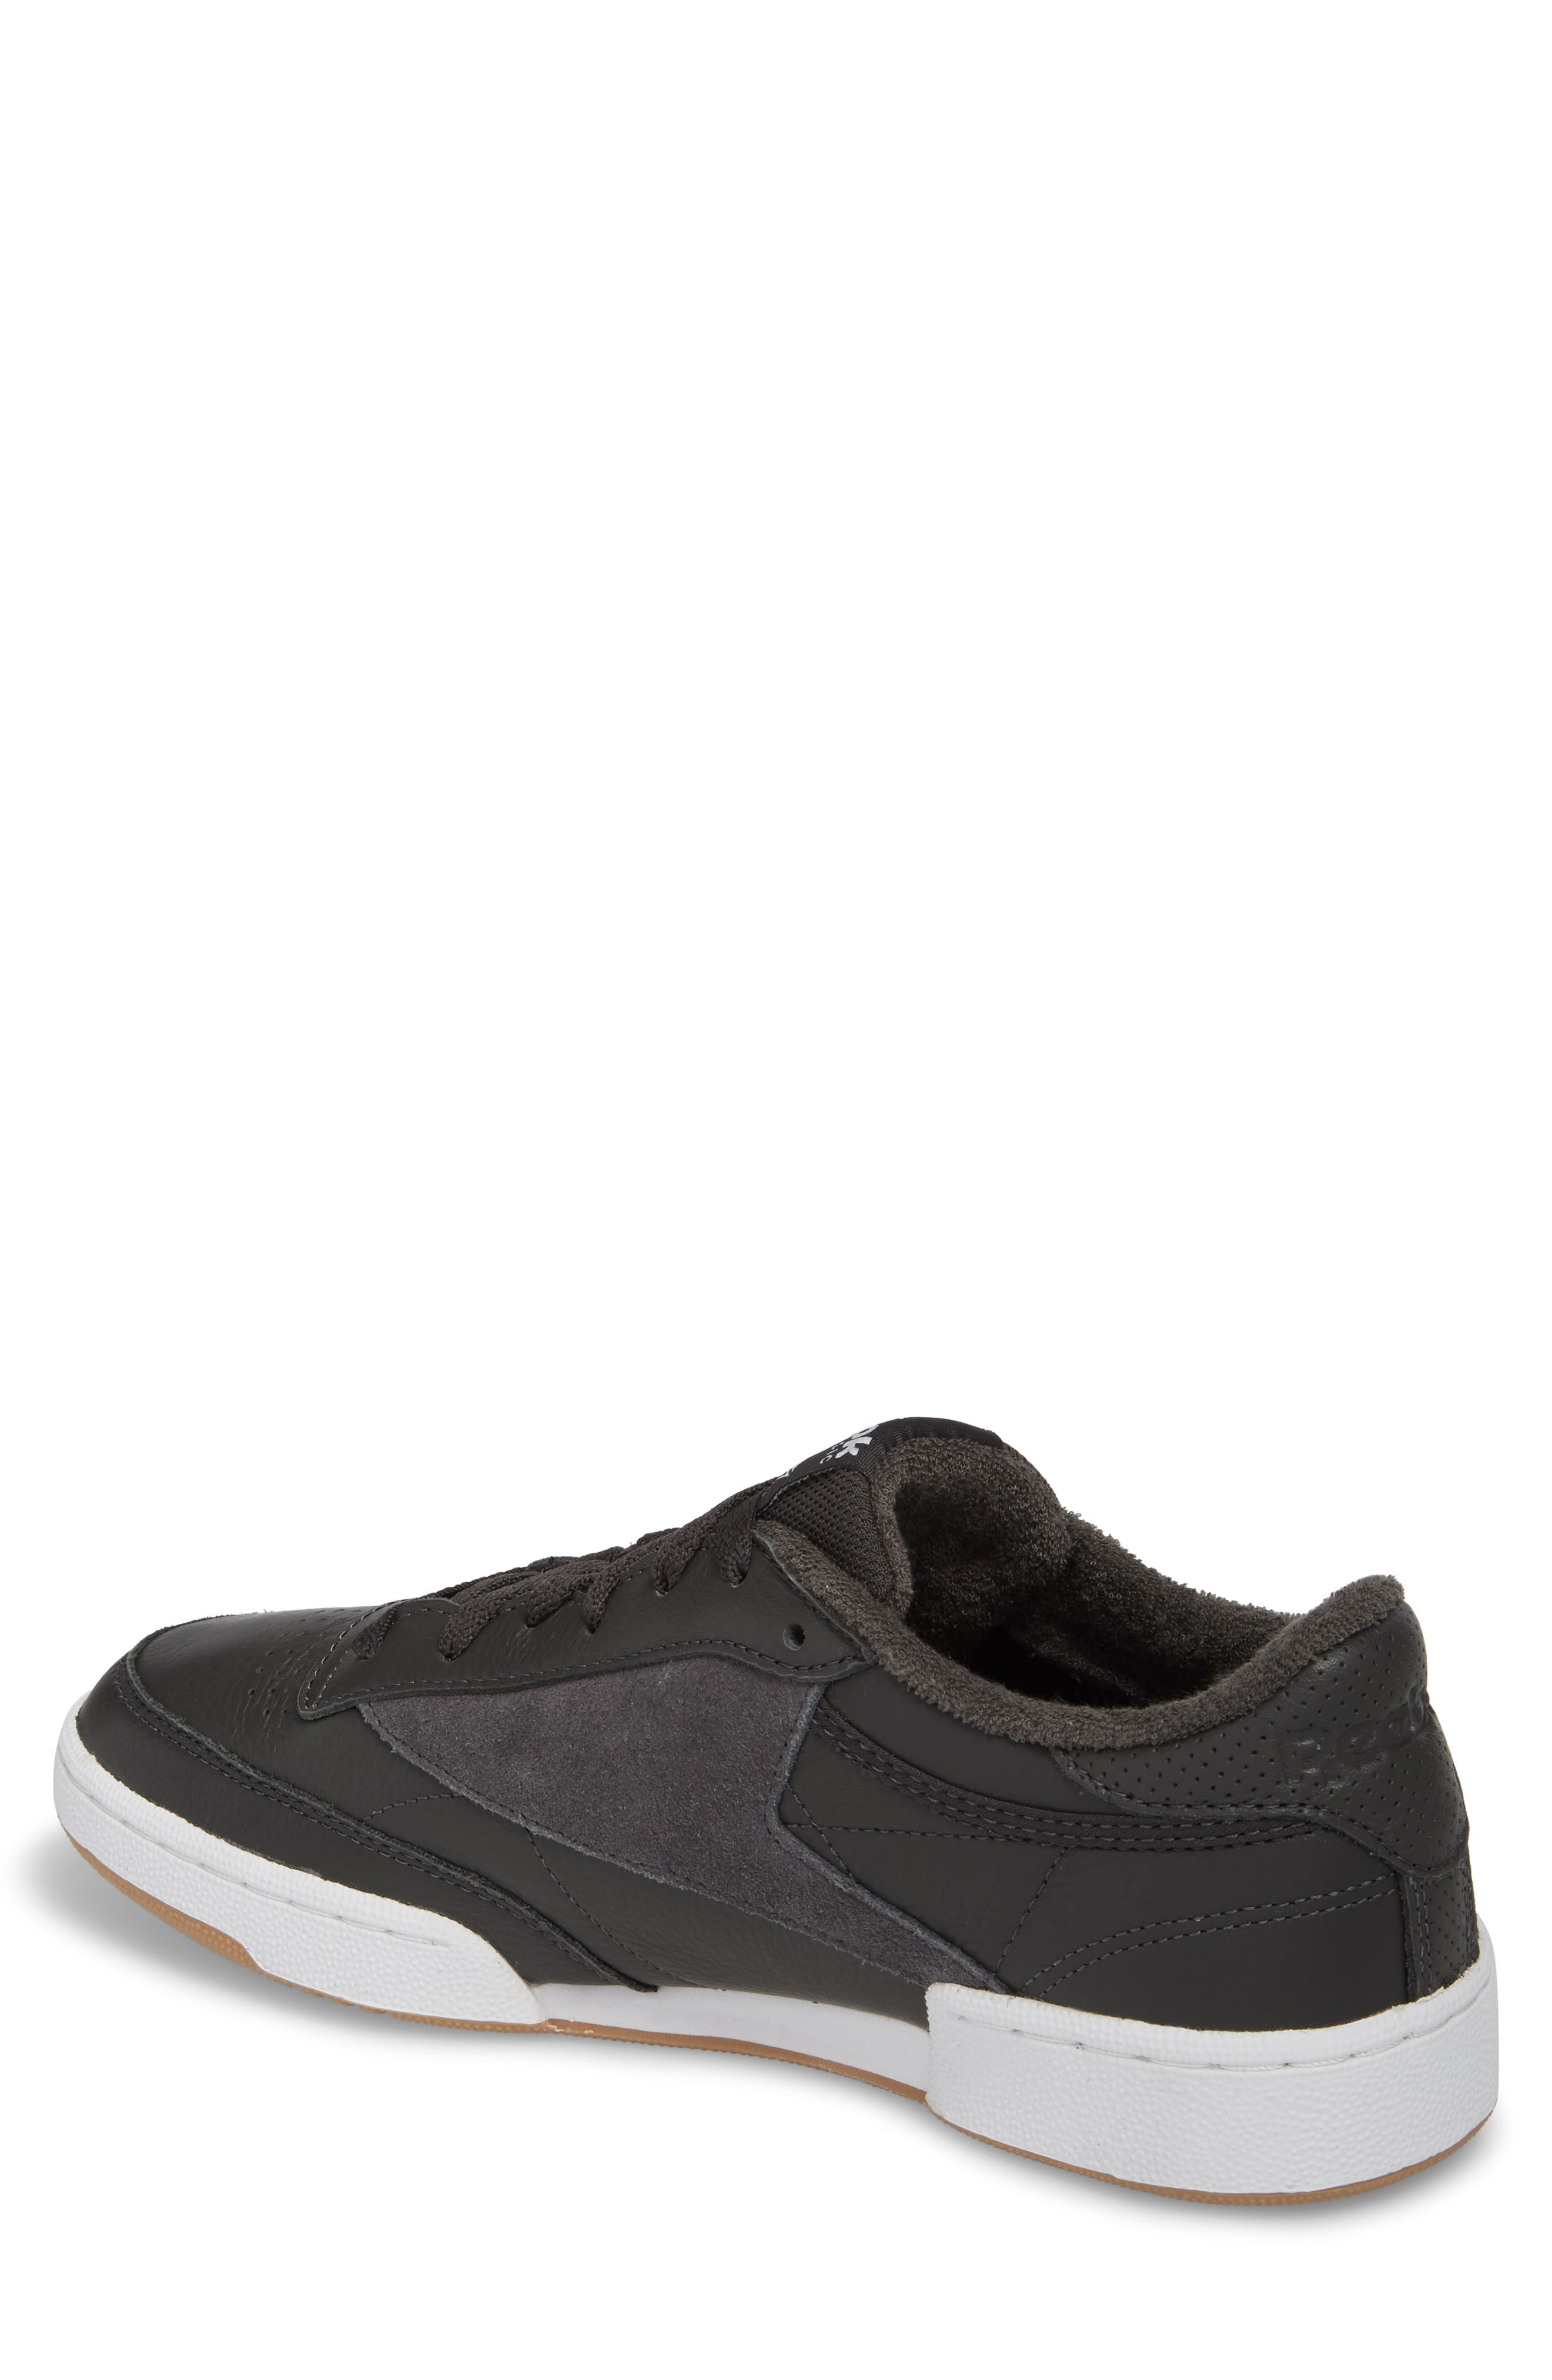 Club C 85 ESTL Sneaker,                             Alternate thumbnail 2, color,                             001